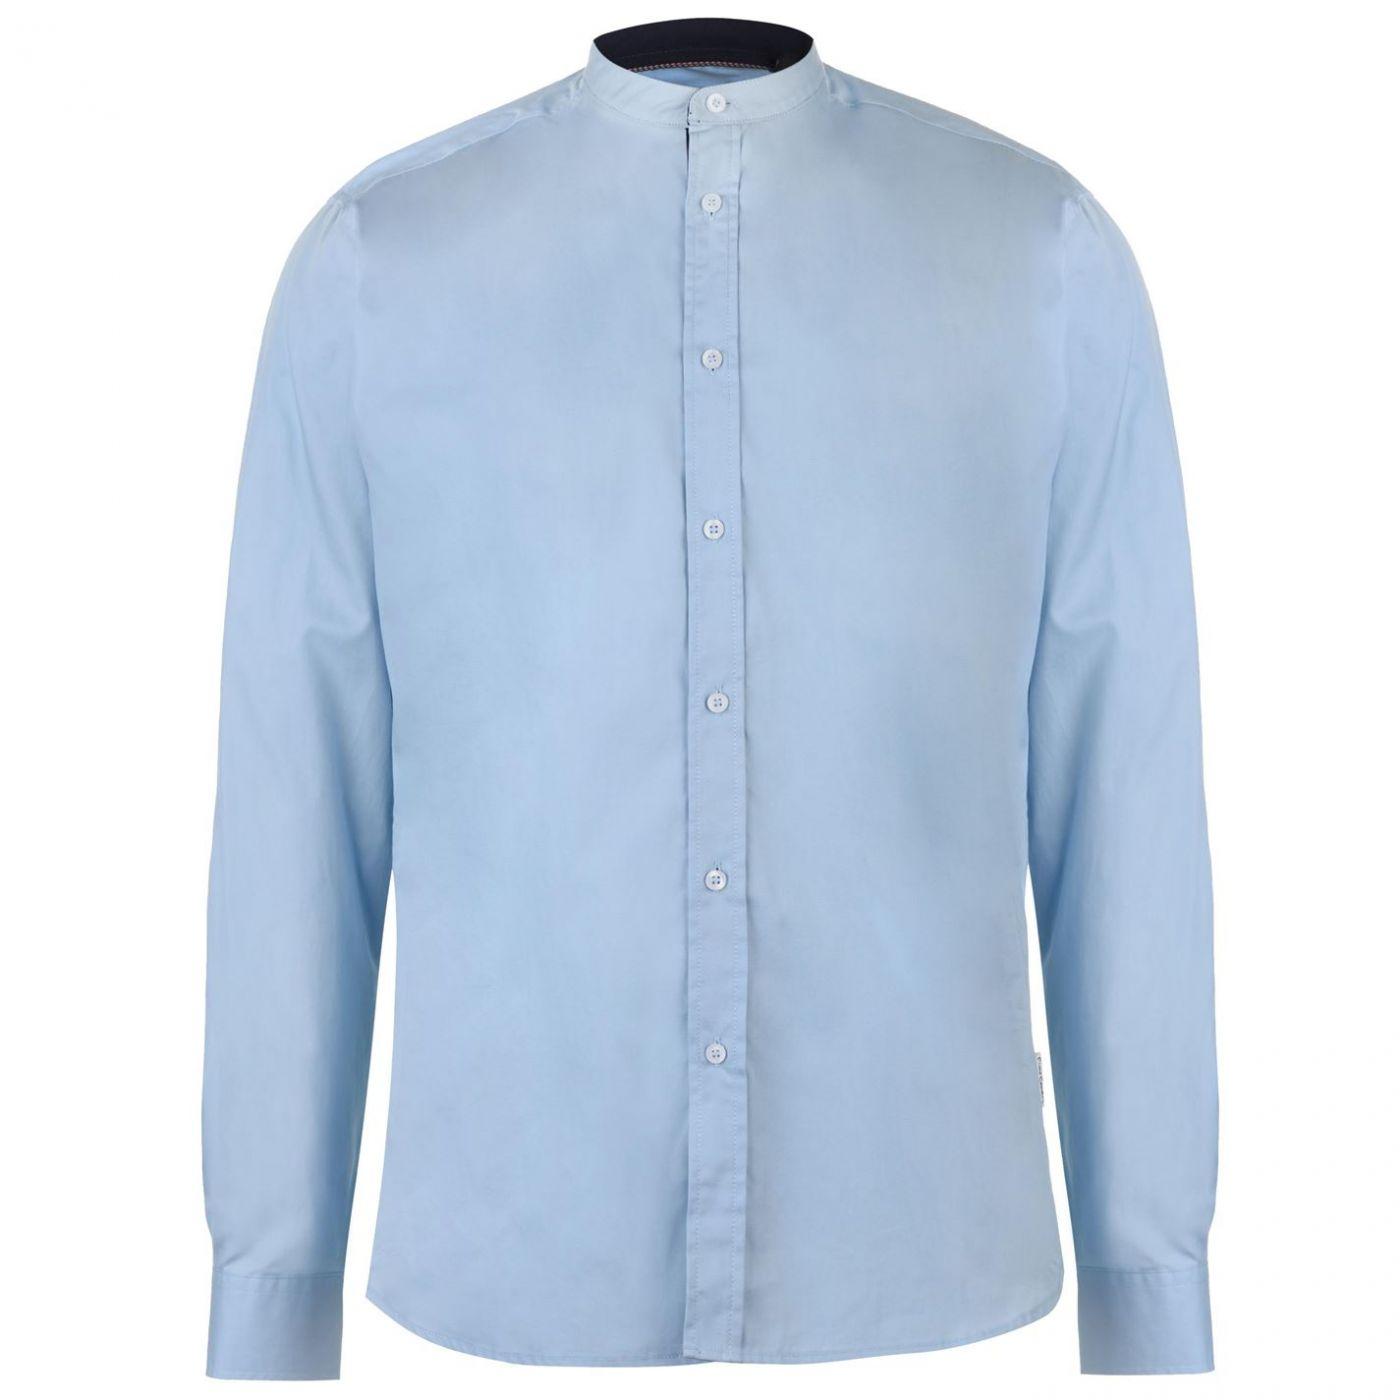 Pierre Cardin Mandarin Collar Long Sleeve Shirt Mens